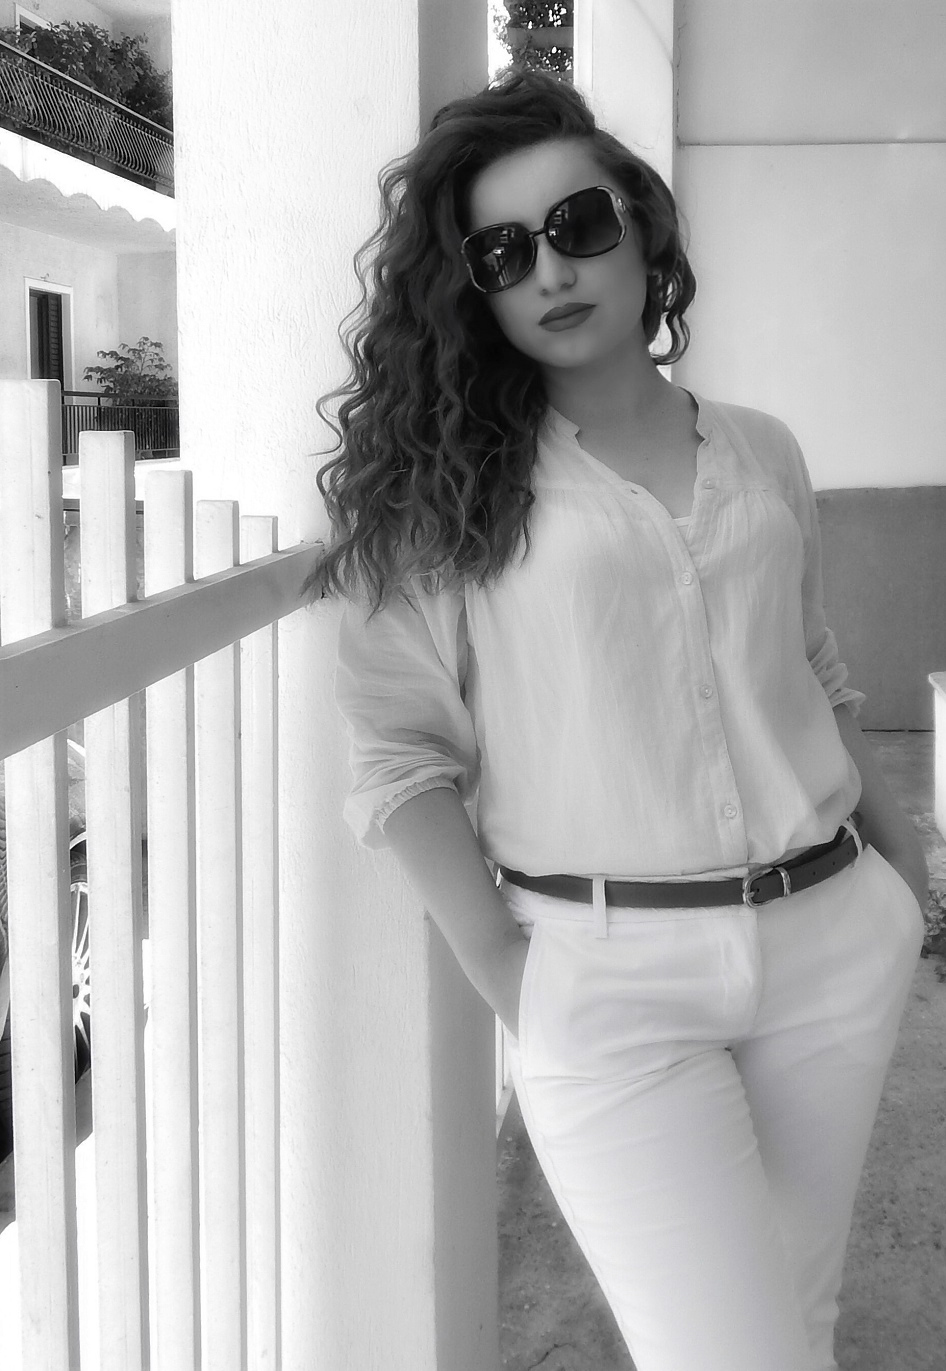 lorena_stroka_instagram_facebook_biografia_albstroka_blog